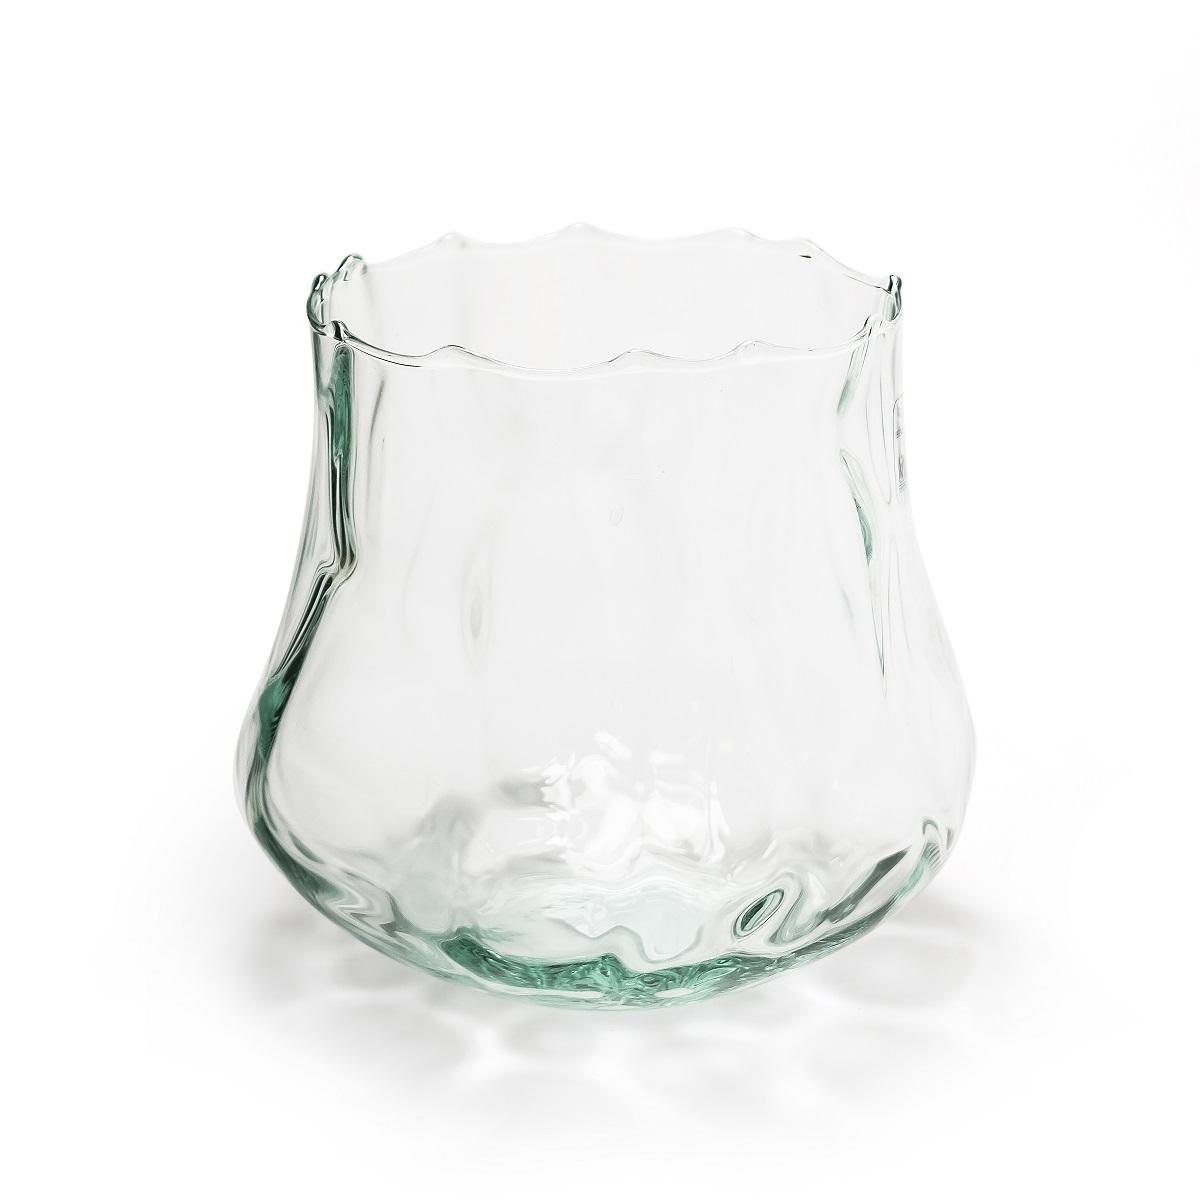 "Orchideenglas Vase Windlicht ""Cloudy"" 17cm recycling Glas eco Glas"